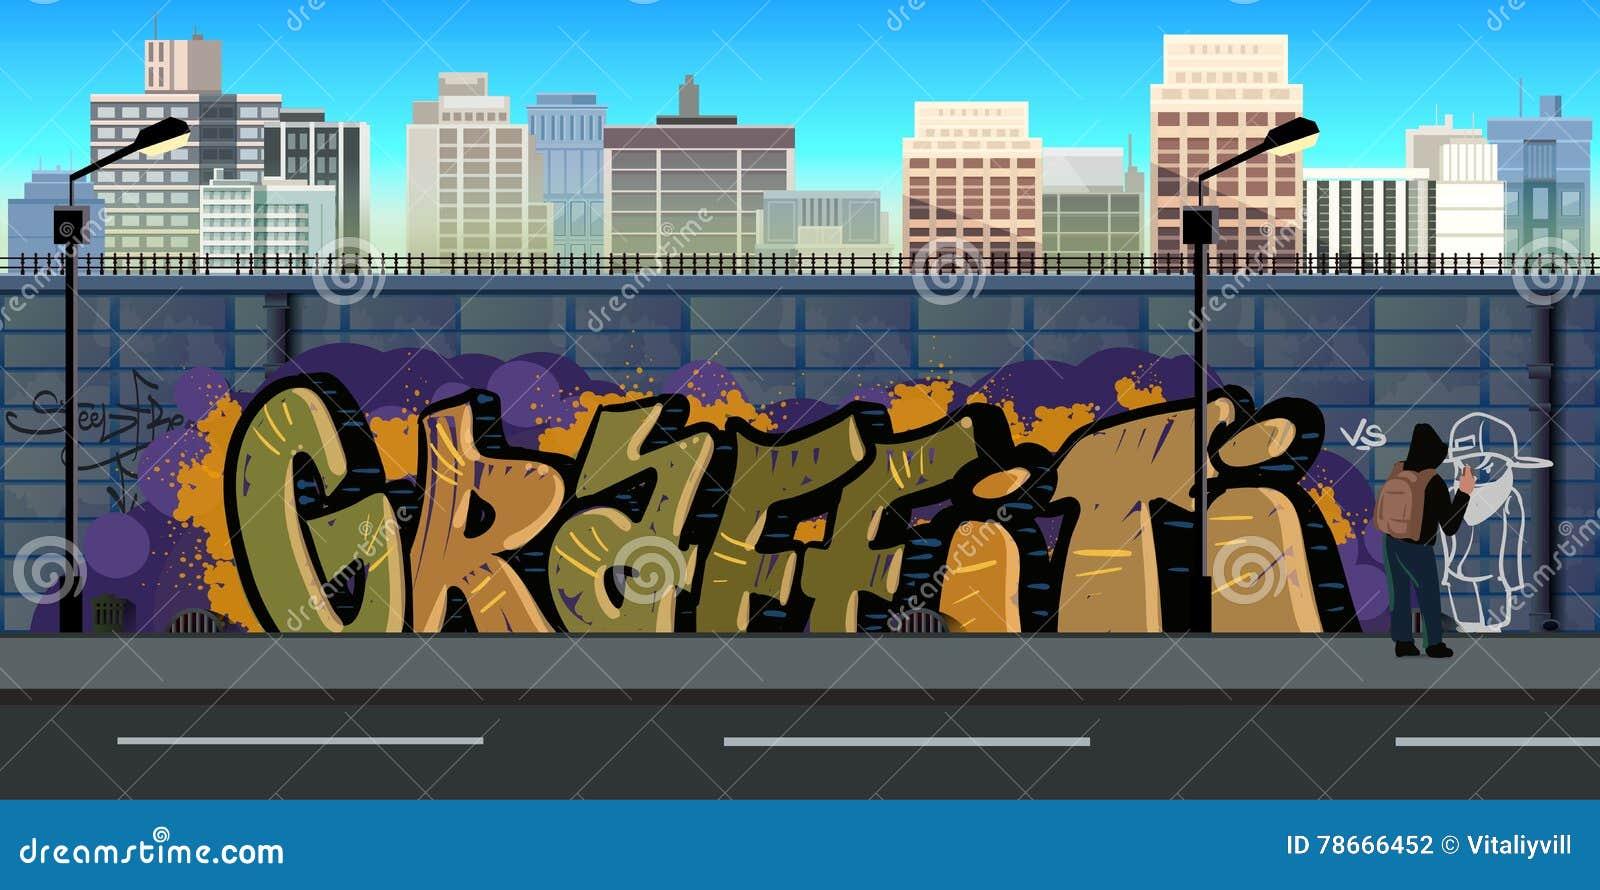 Graffiti wall vector free - Art Background Graffiti Illustration Urban Vector Wall